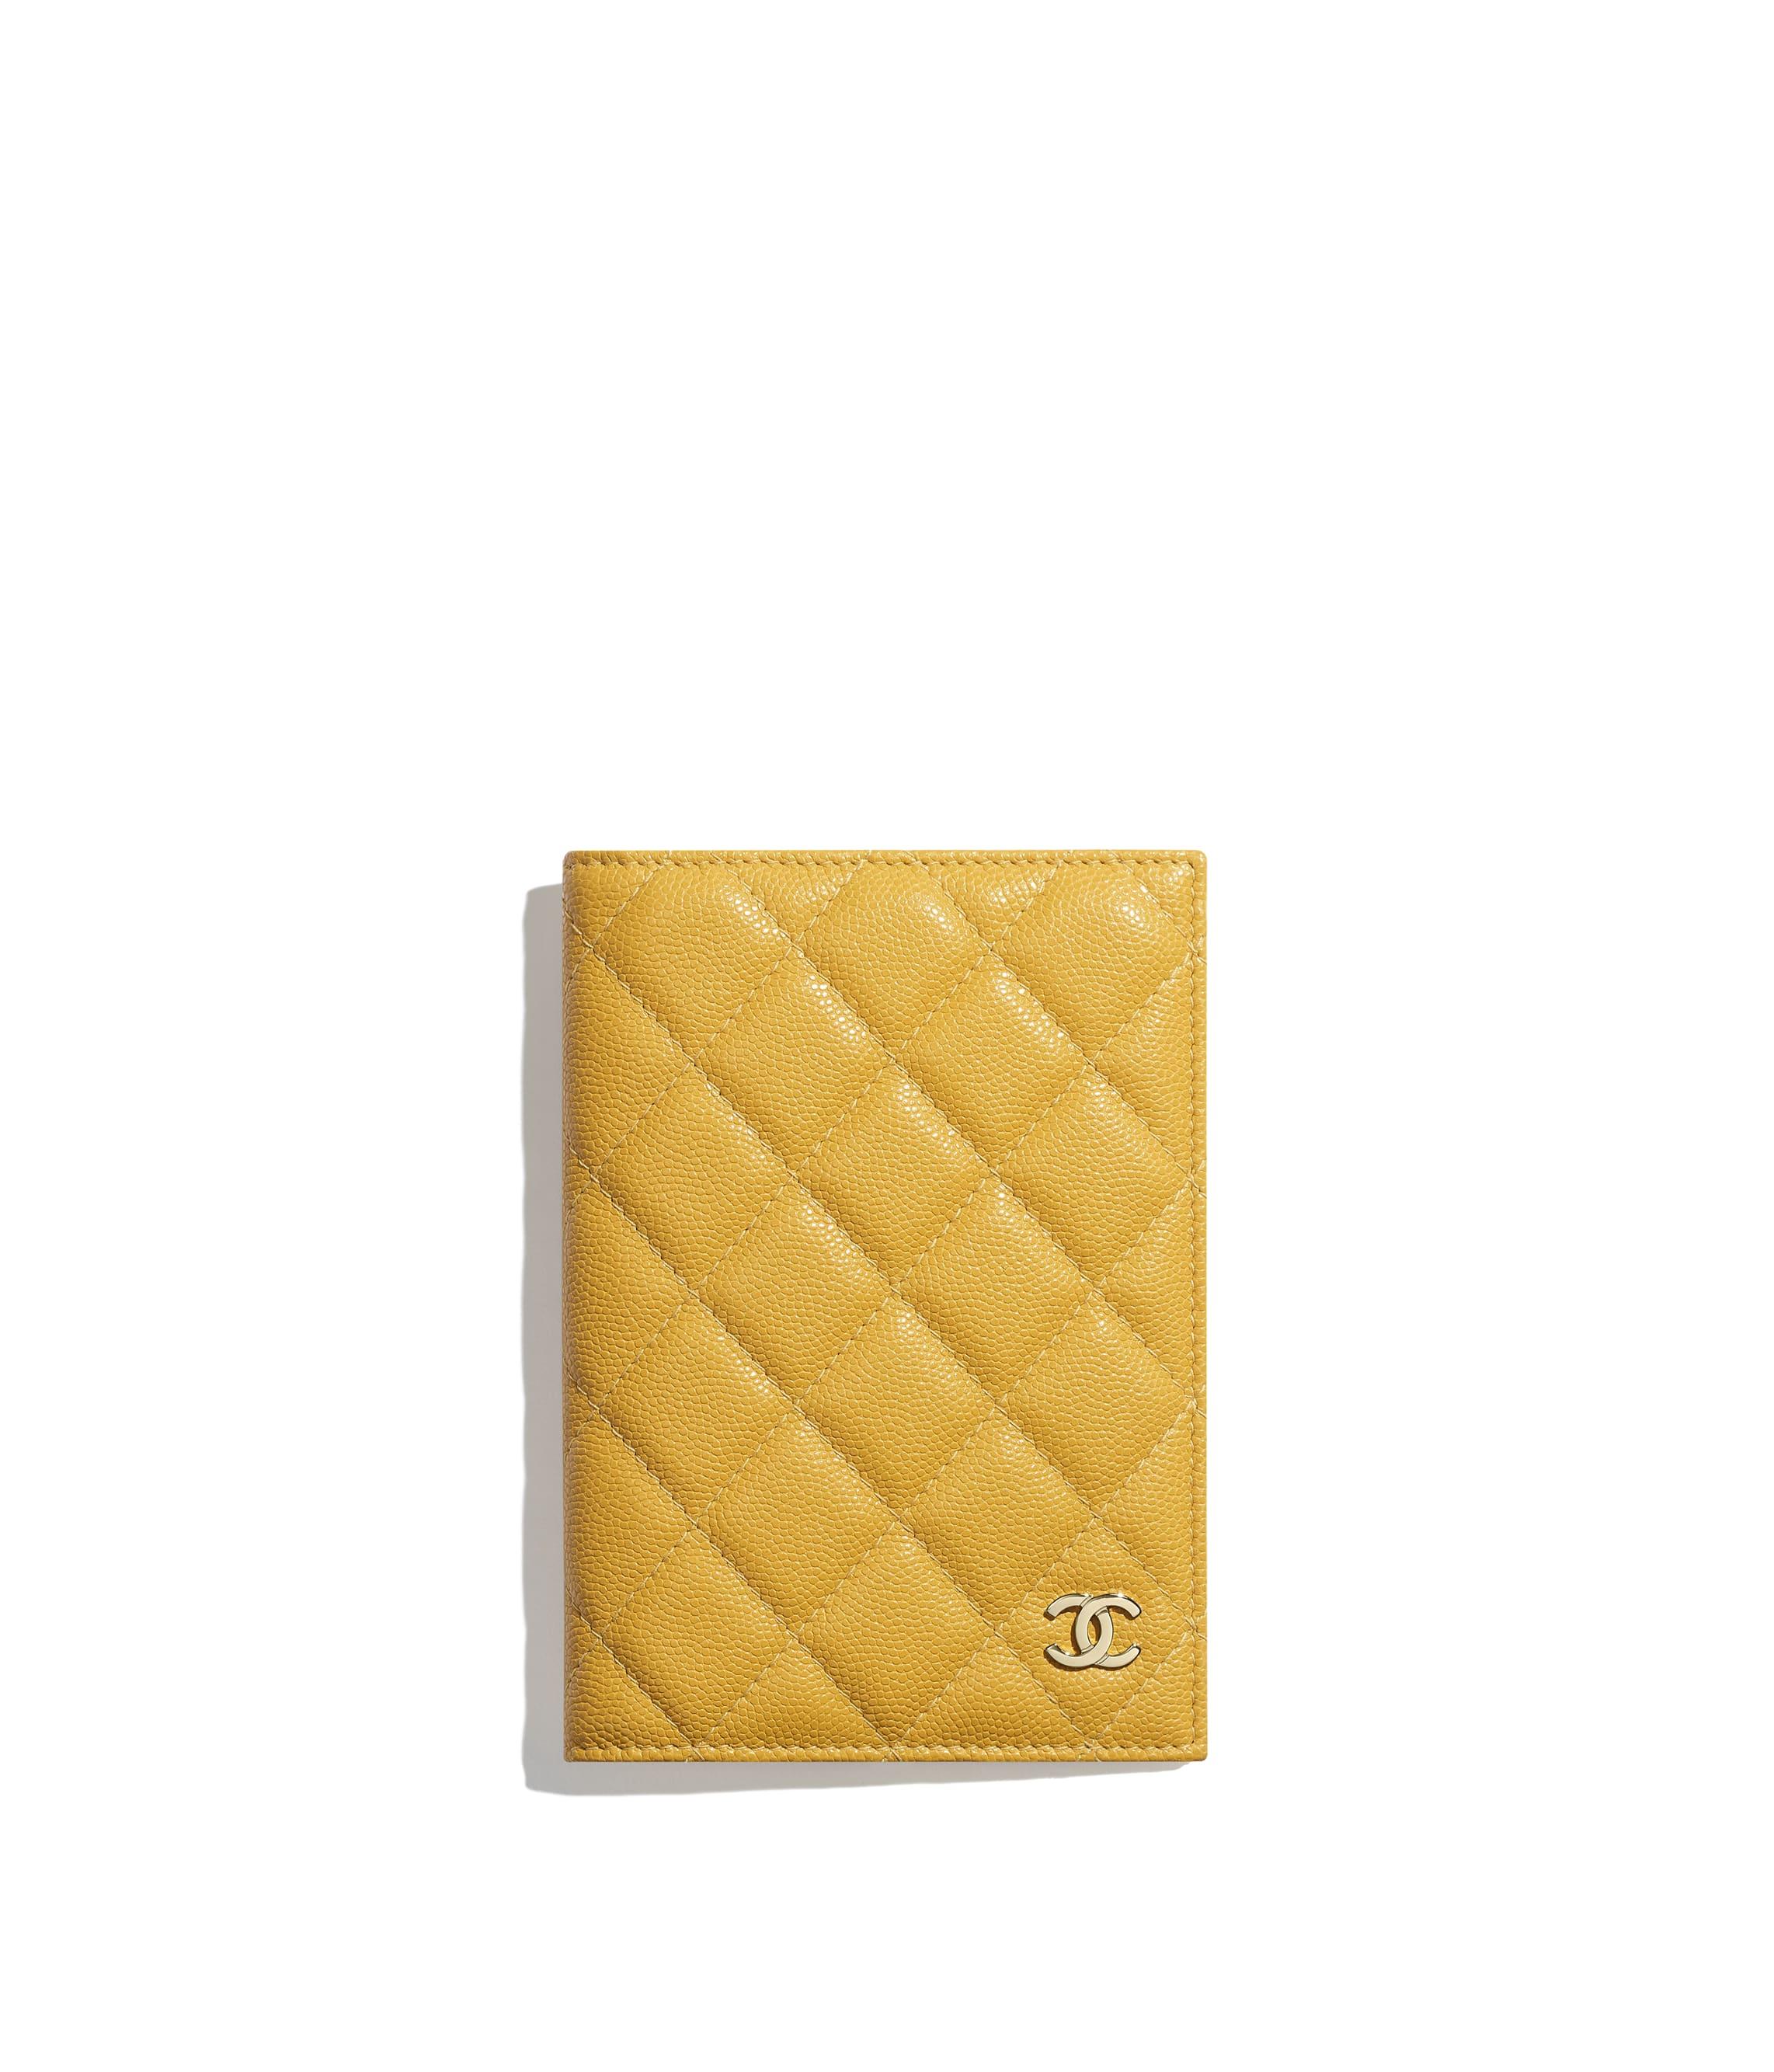 9d0cdb1eccda Classic Passport Holder, grained calfskin & gold-tone metal, yellow ...